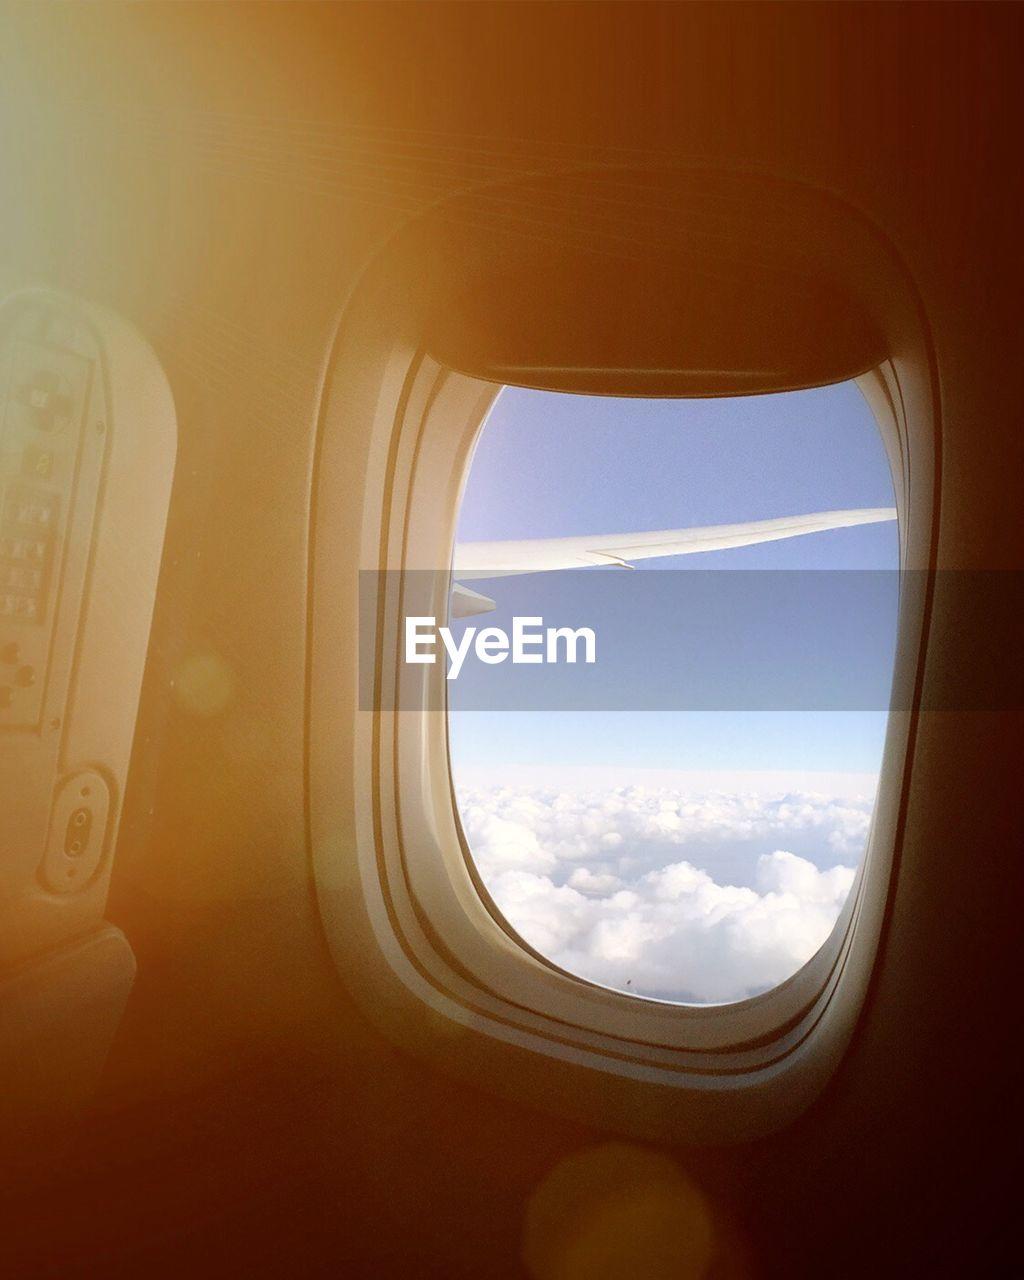 Airplane seen through window